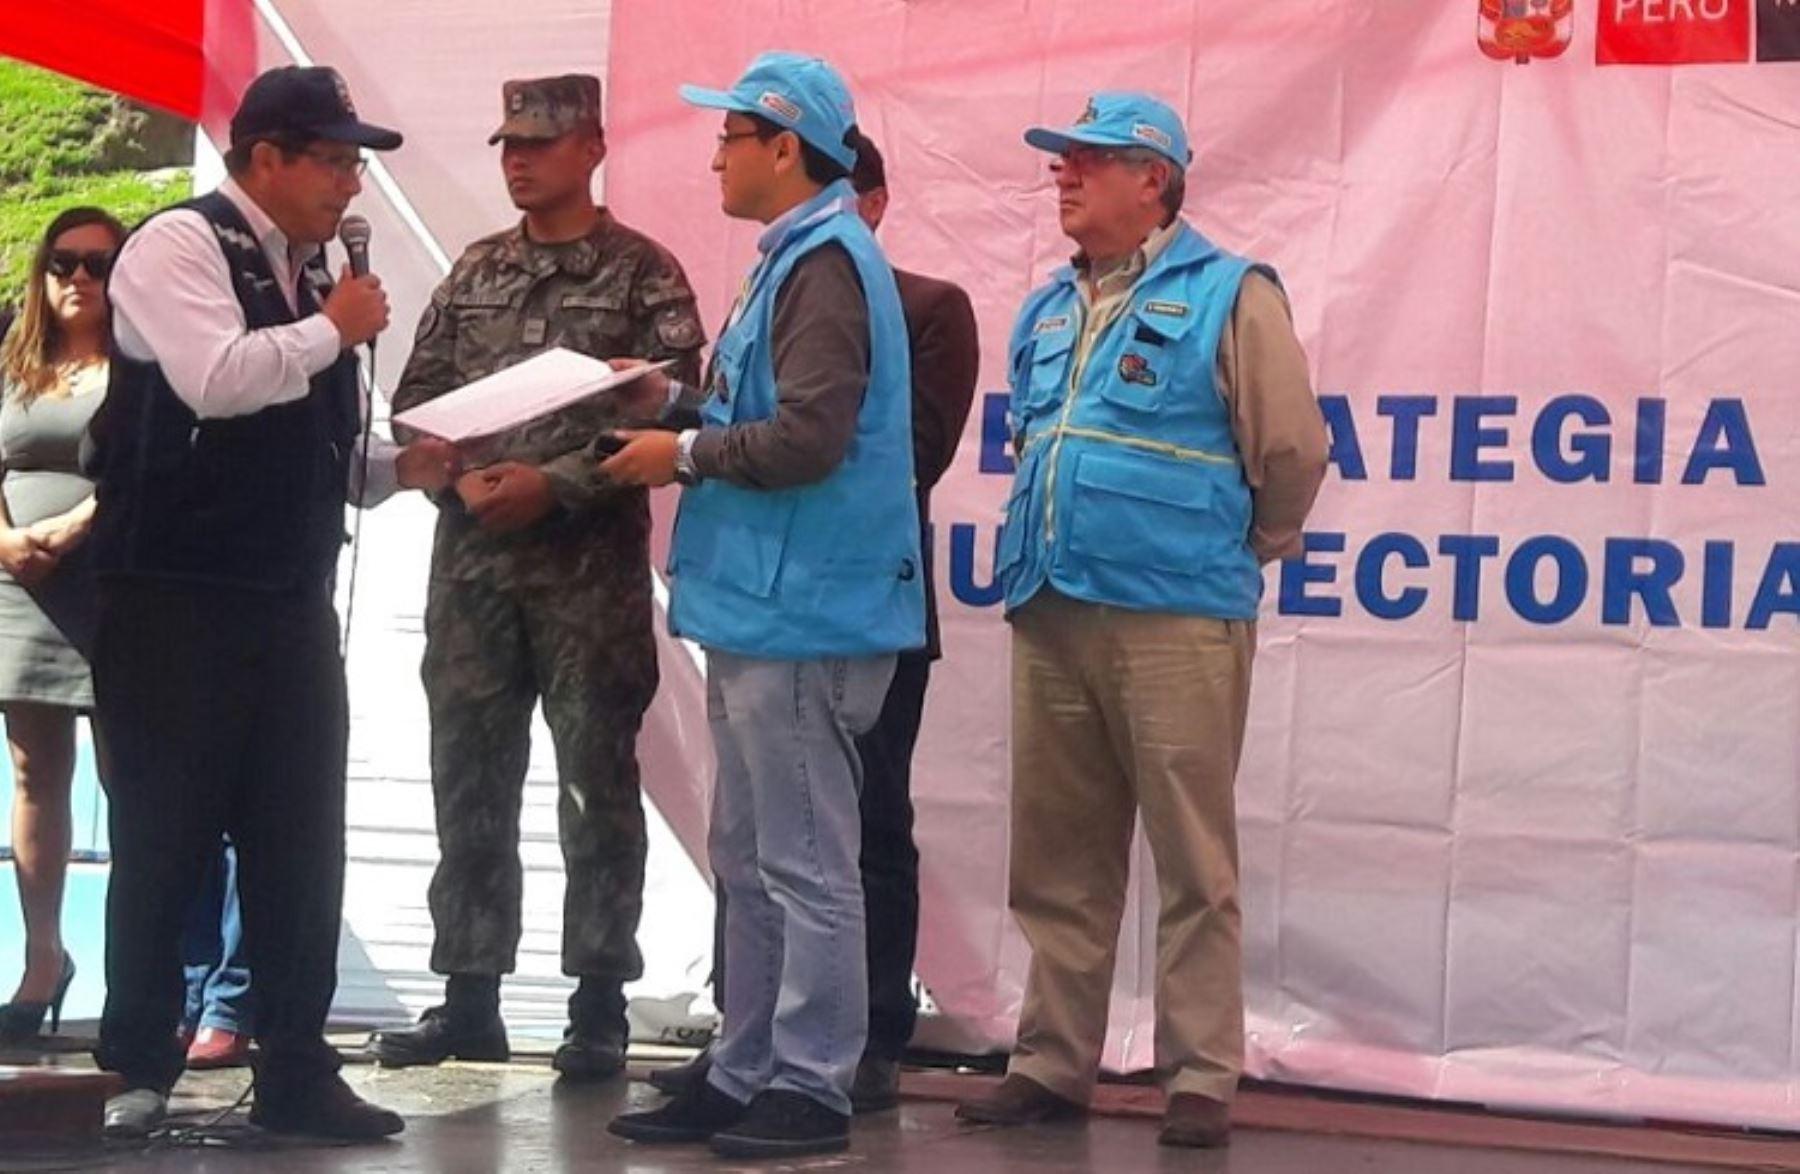 Barrio seguro estrategia multisectorial contra la for Donde esta el ministerio del interior